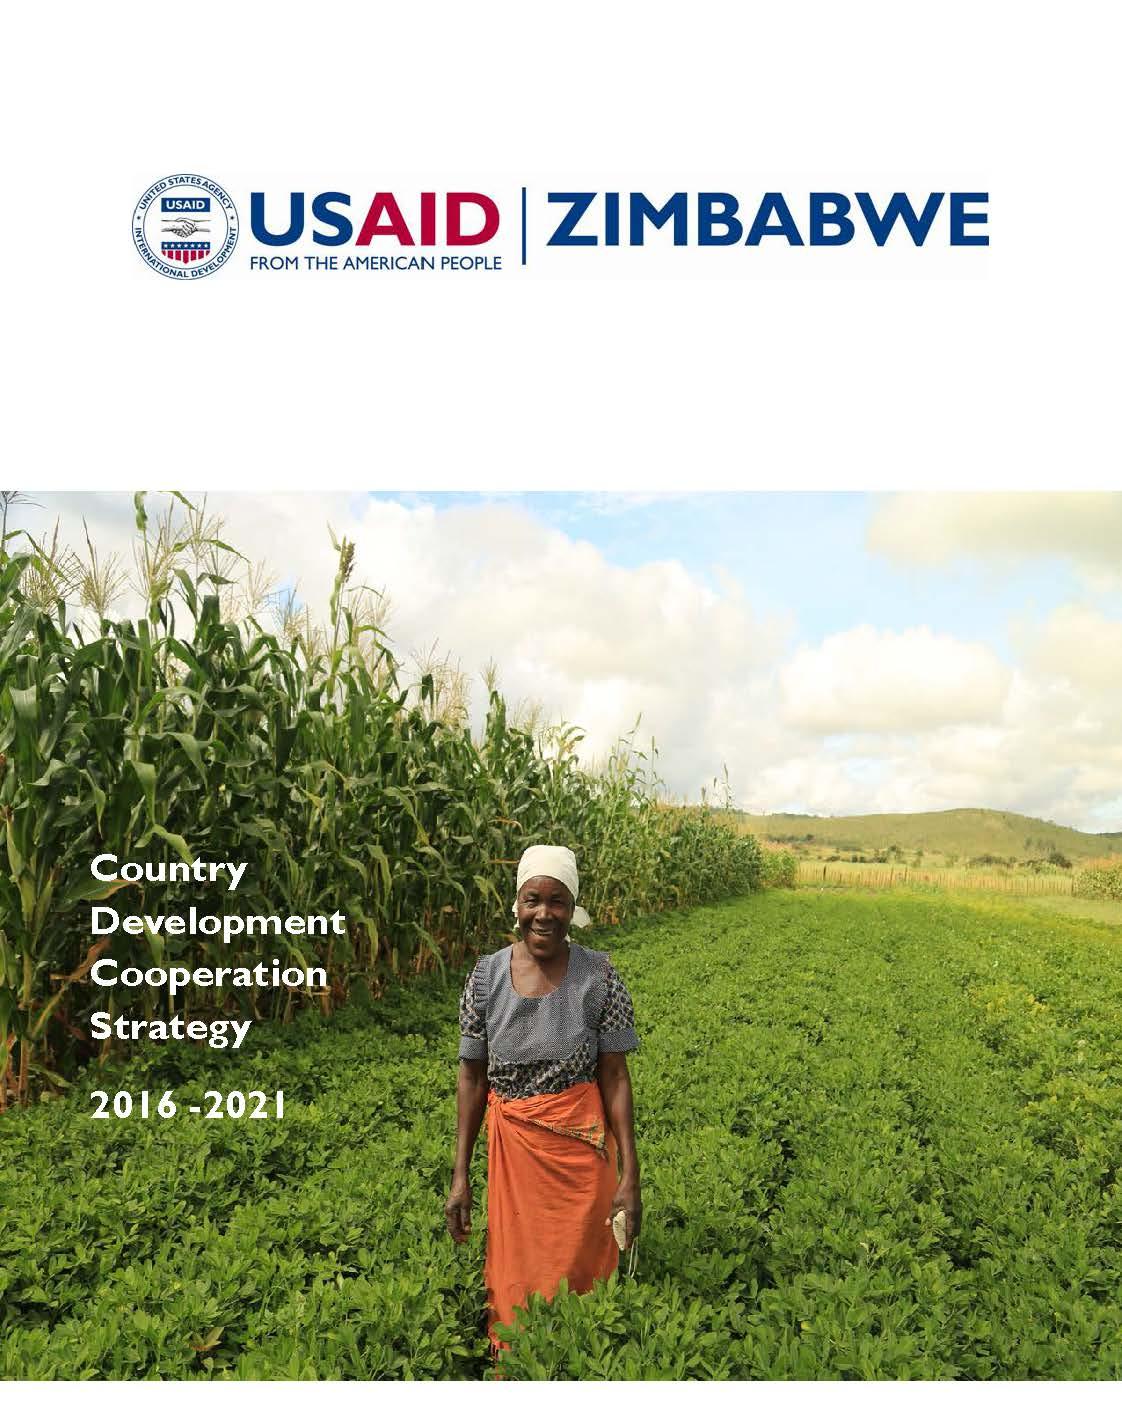 USAID/Zimbabwe Country Development Cooperation Strategy 2016 -2021